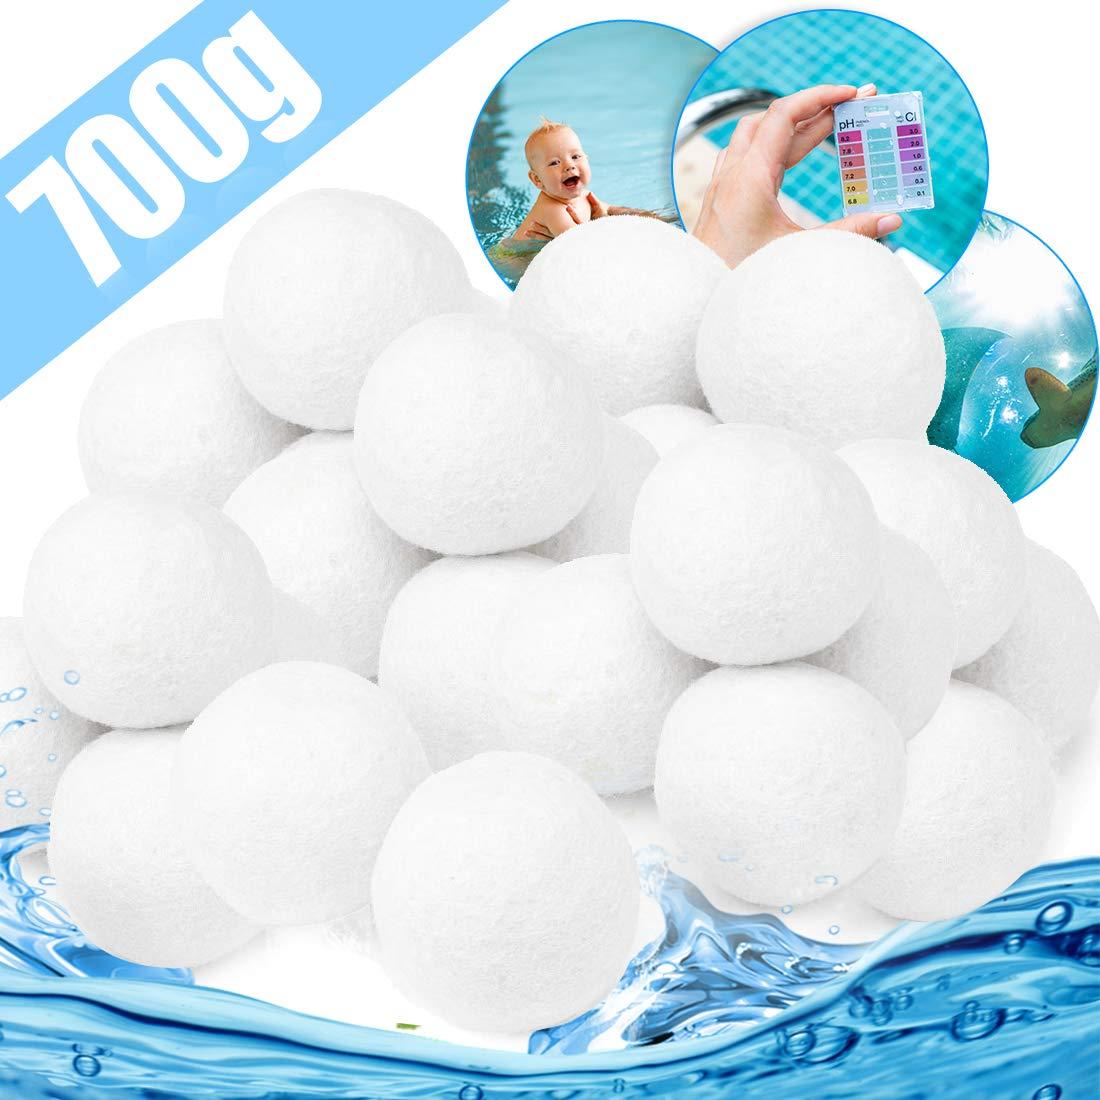 700g Pool Filter Balls Eco-Friendly Fiber Filter Media